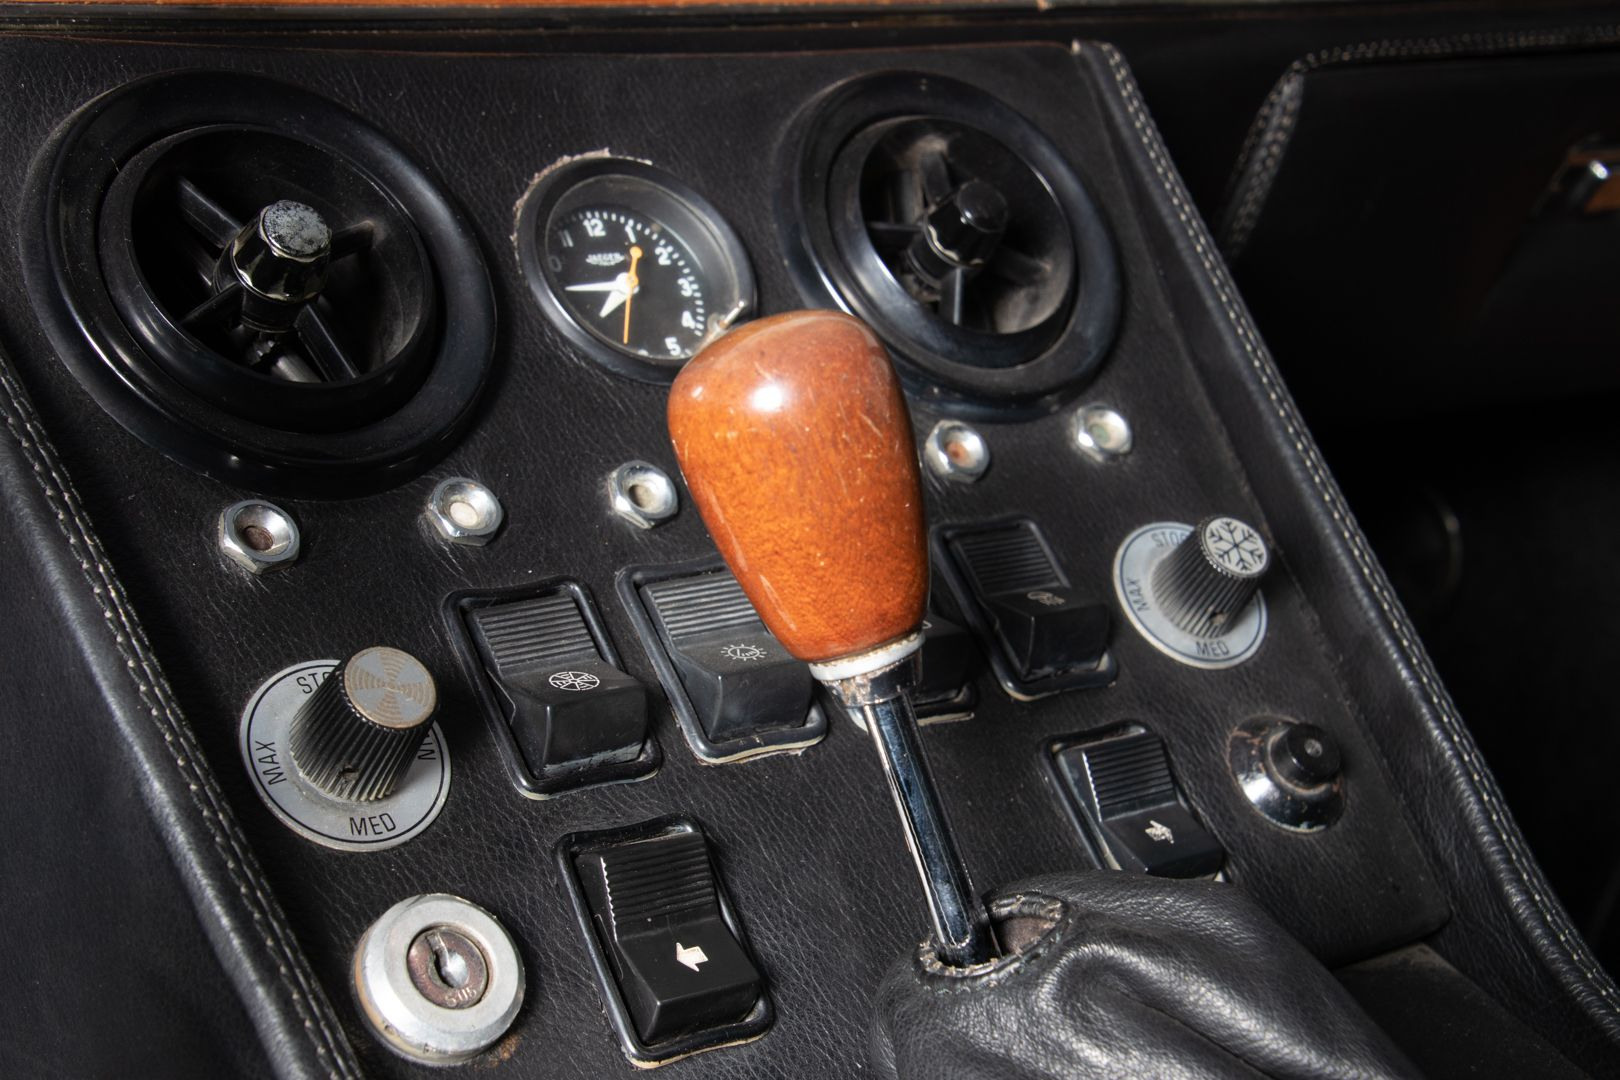 1970 Lamborghini Espada II° Serie 22690